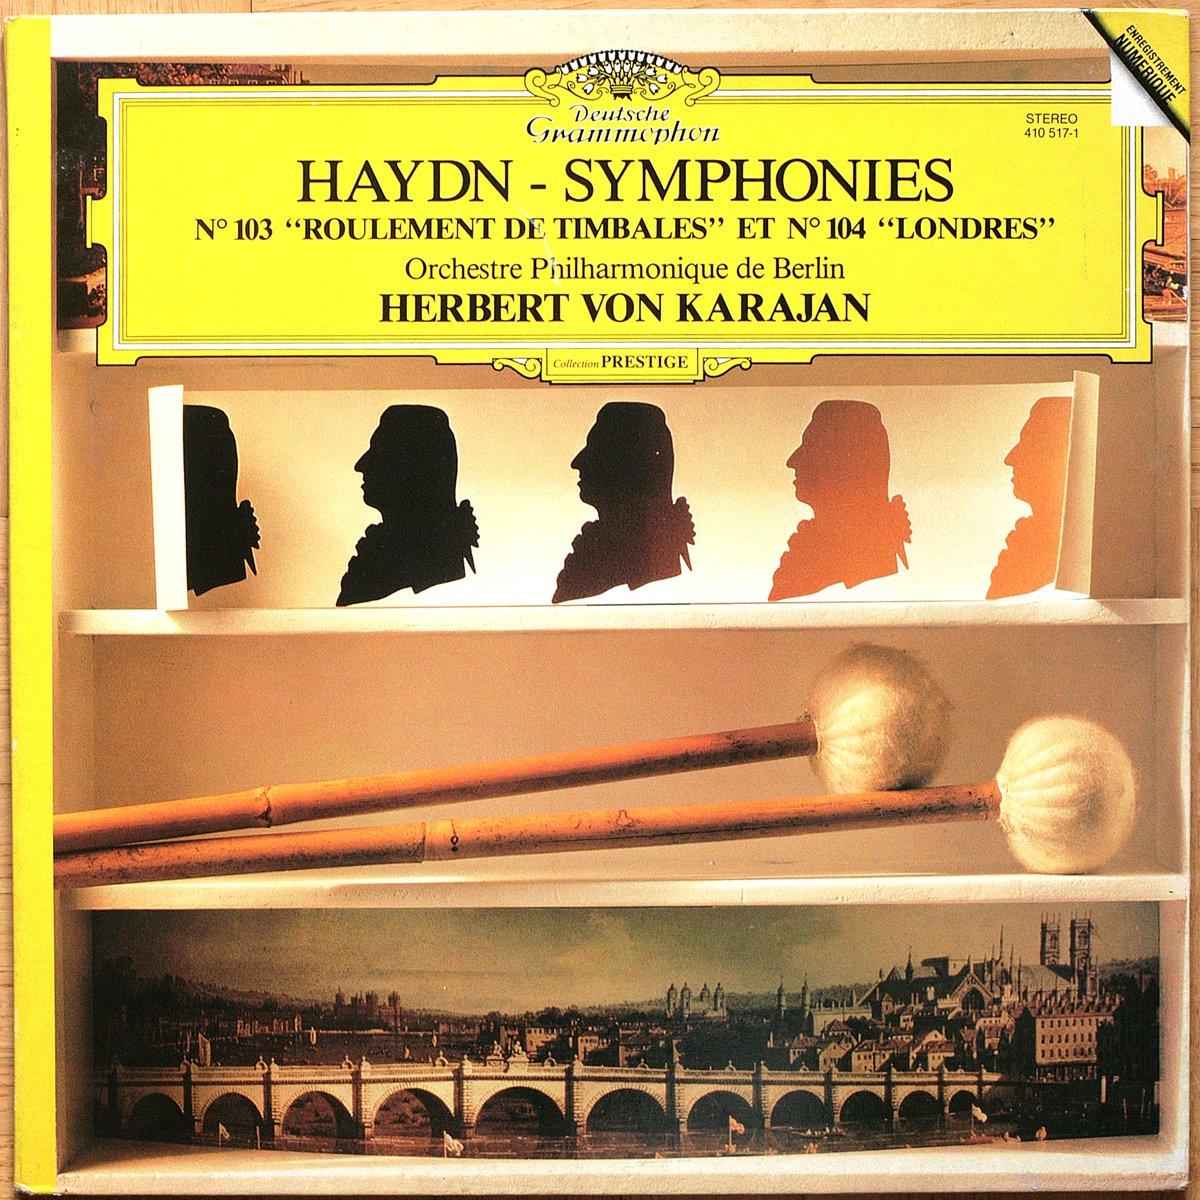 DGG 410 517 Haydn Symphonies 103 & 104 Karajan DGG Digital Aufnahme